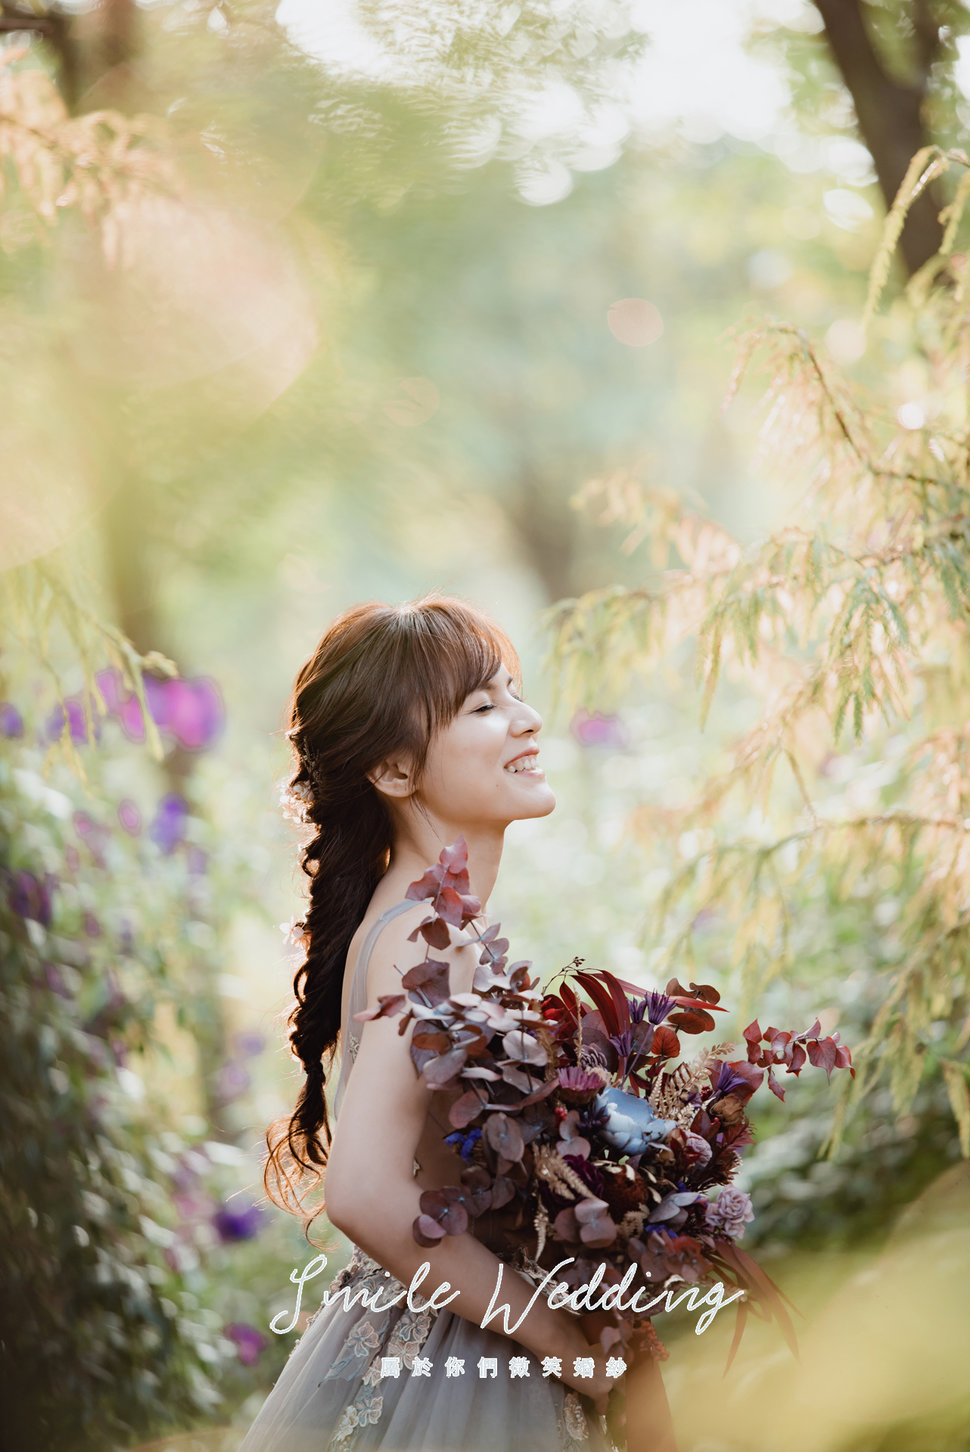 WEI_3215 - Smile wedding 微笑婚紗《結婚吧》